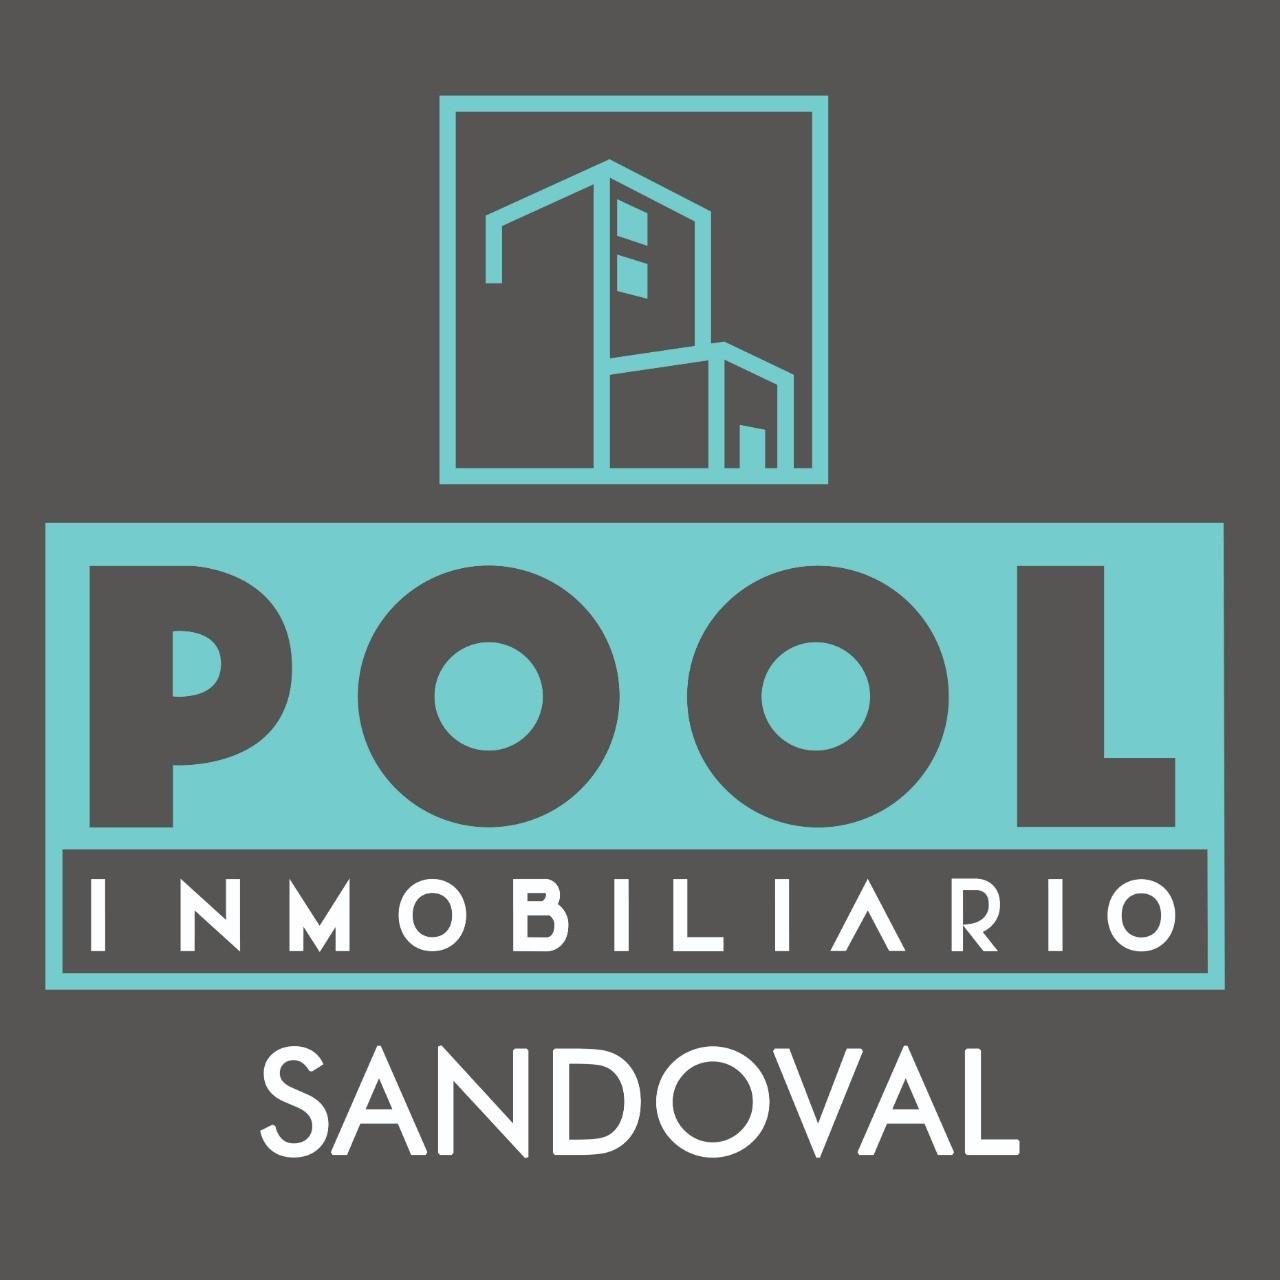 POOL_INMOBILIARIO_SANDOVAL.